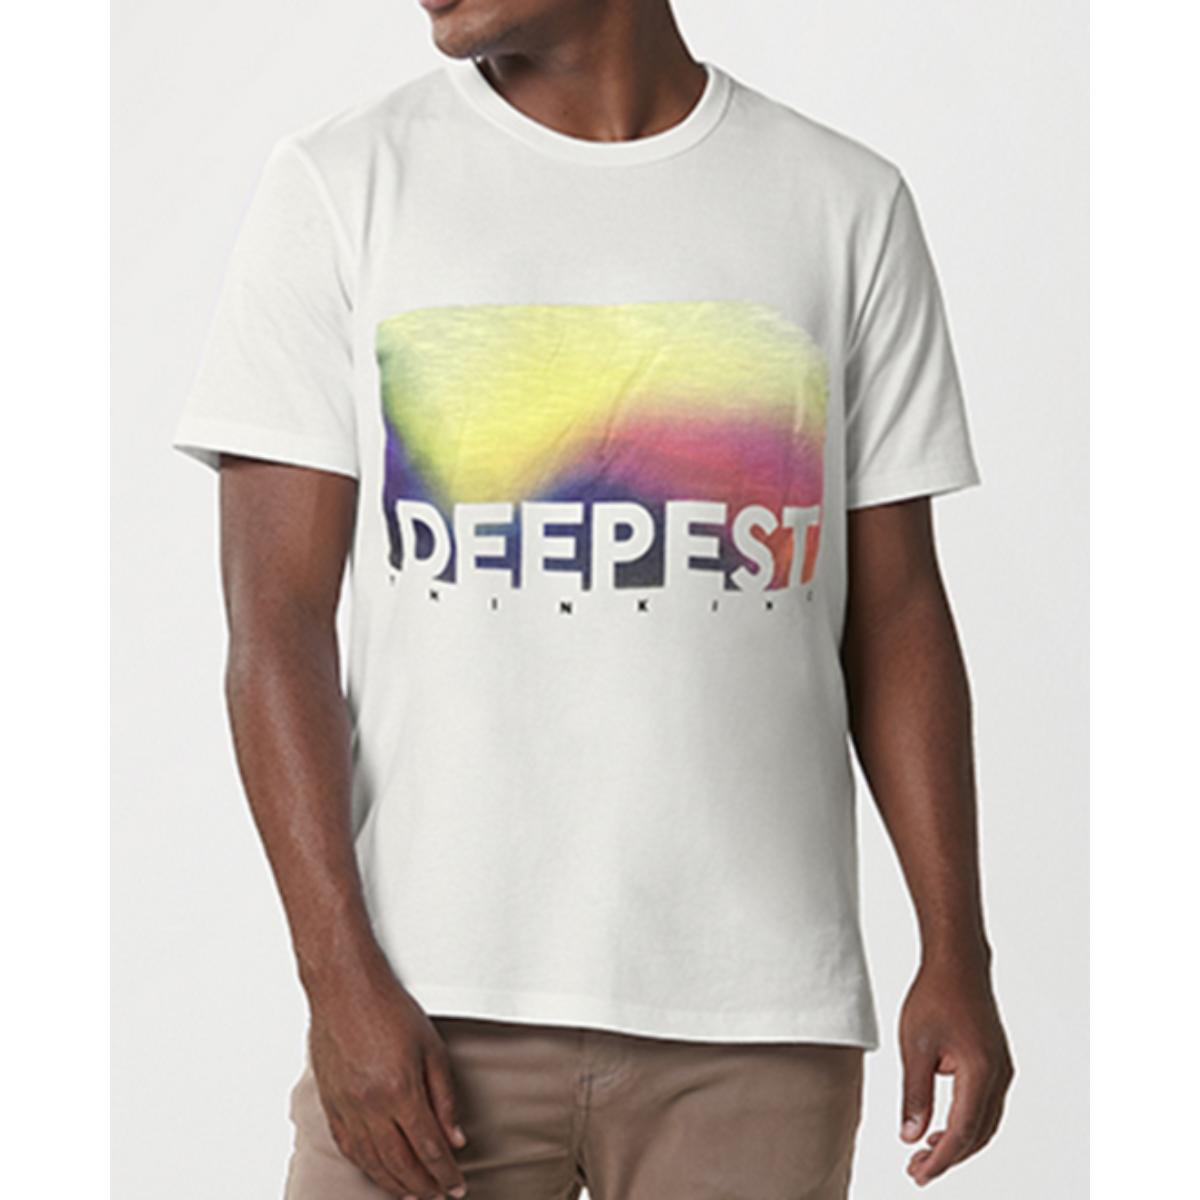 Camiseta Masculina Hering 4f87 1gen Off White